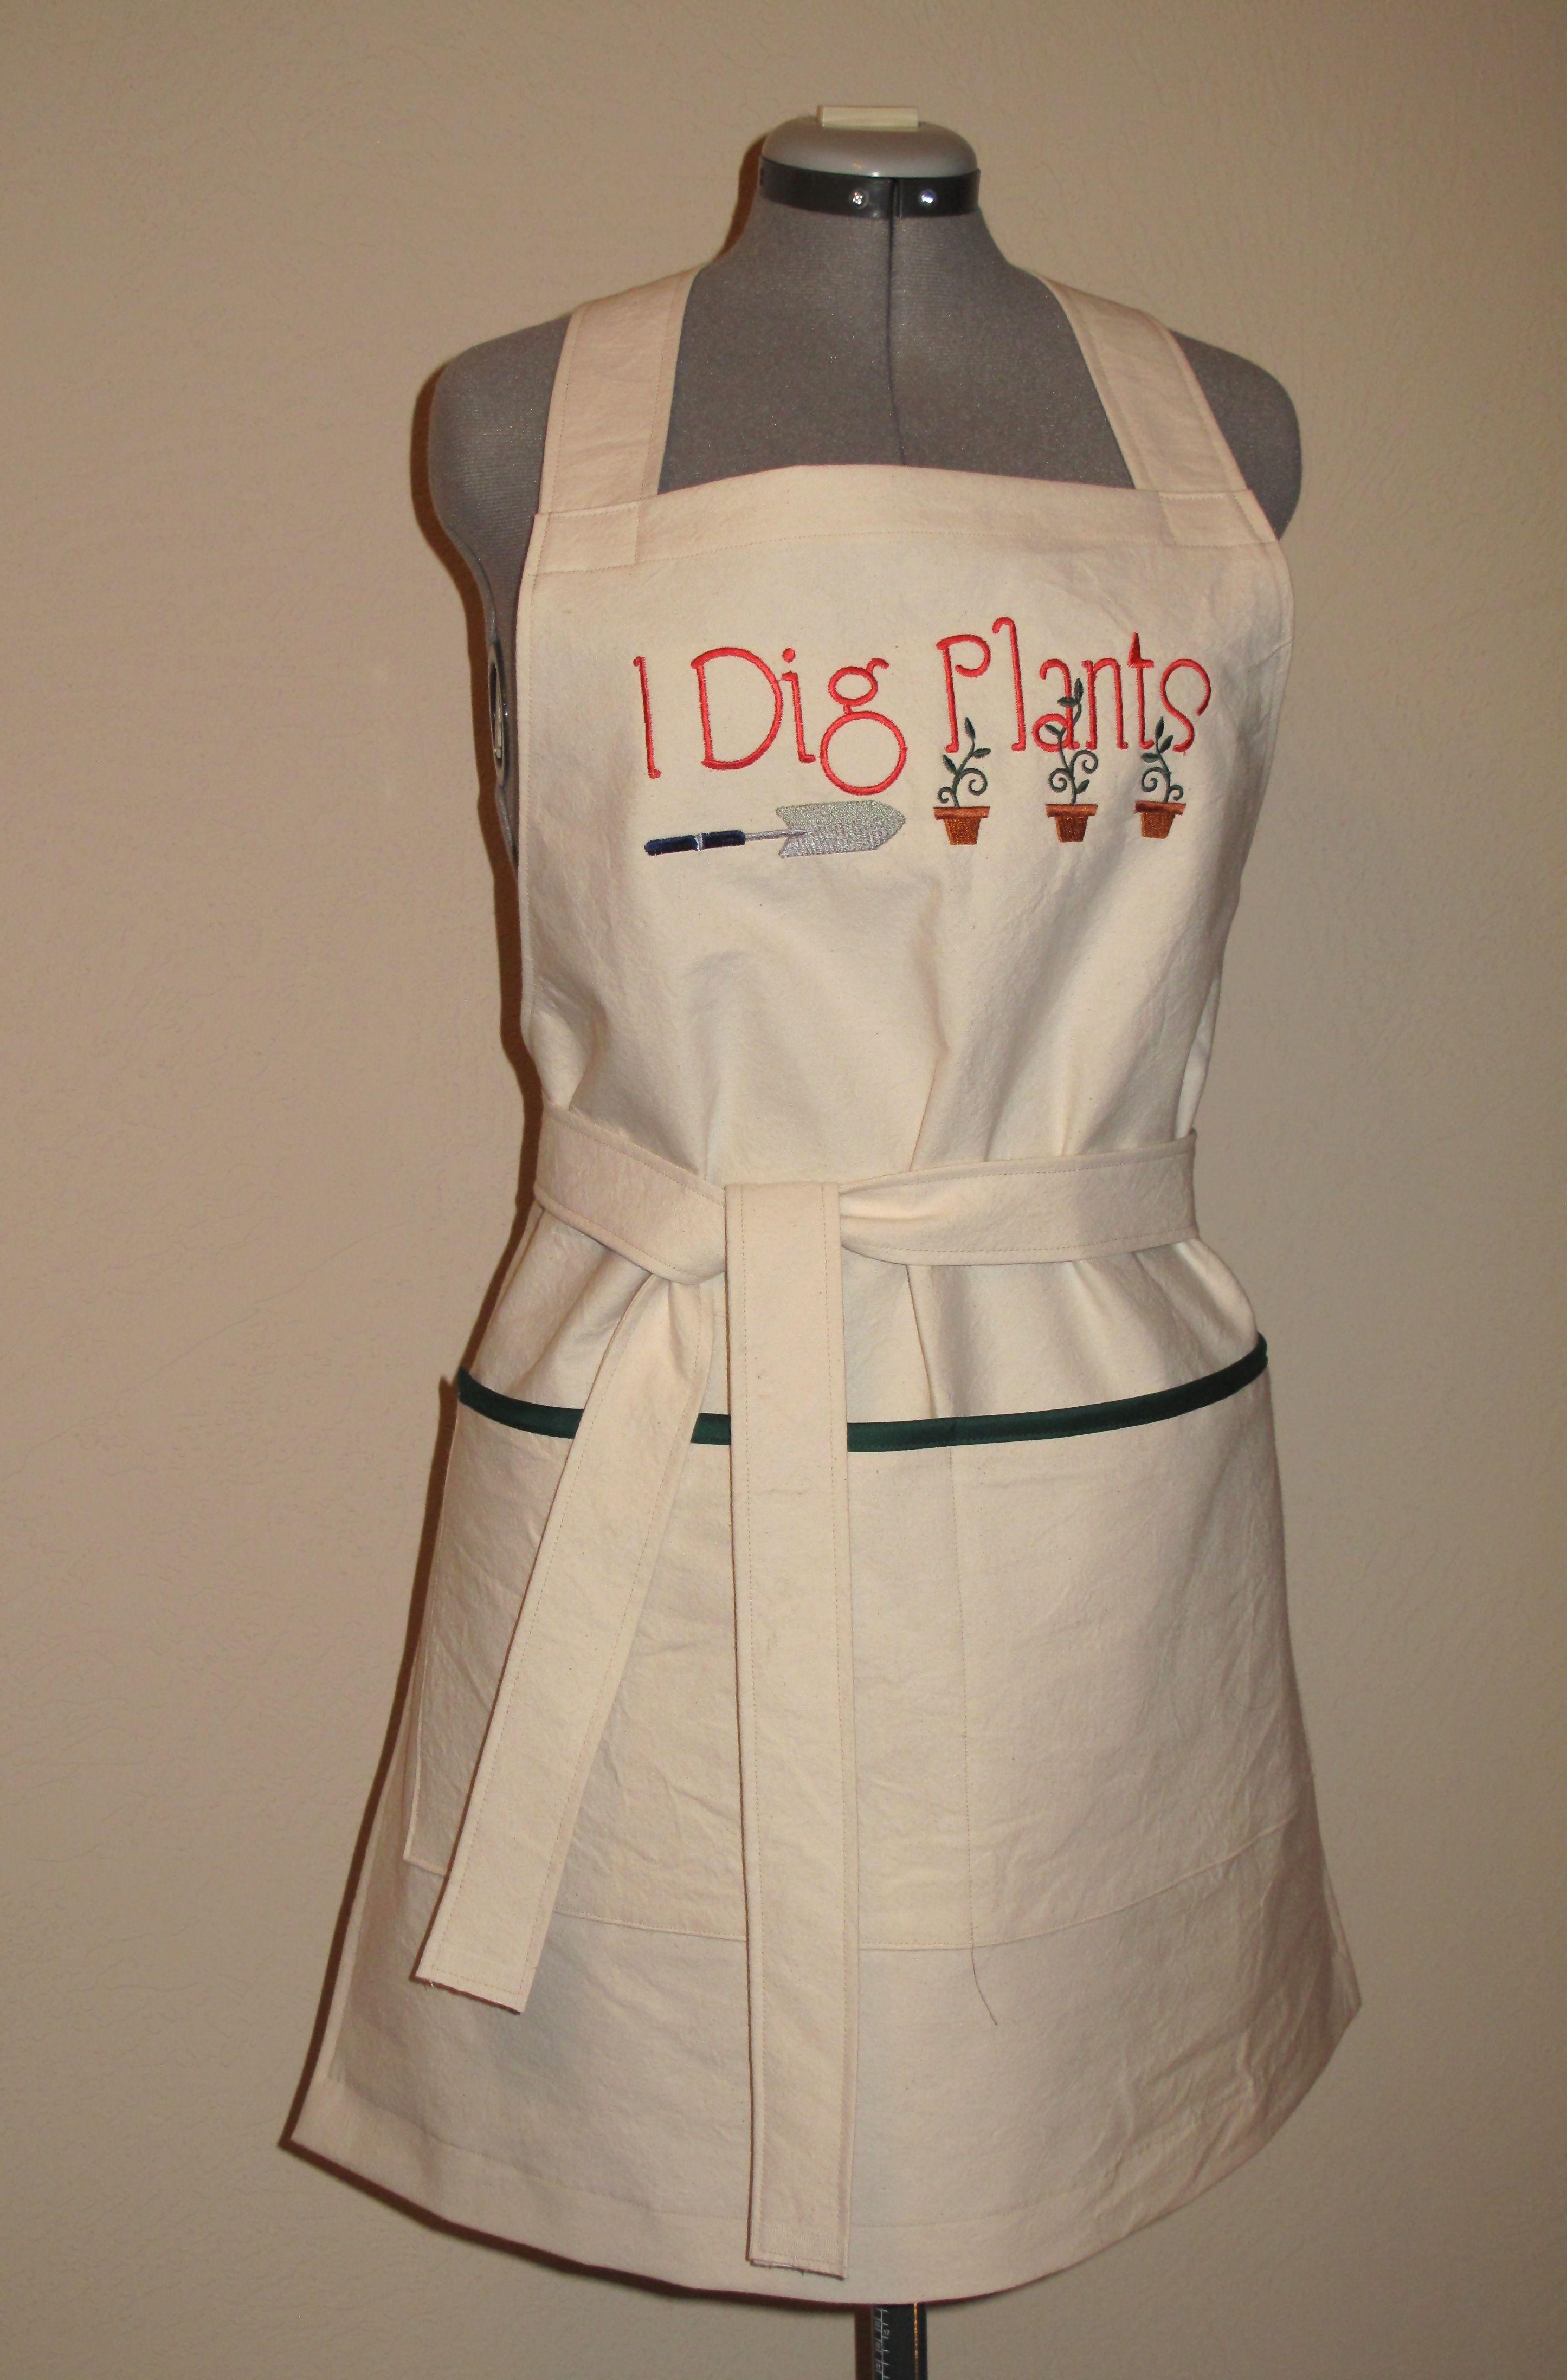 White apron joann fabrics - Mg I Dig Plants Embroidered Apron